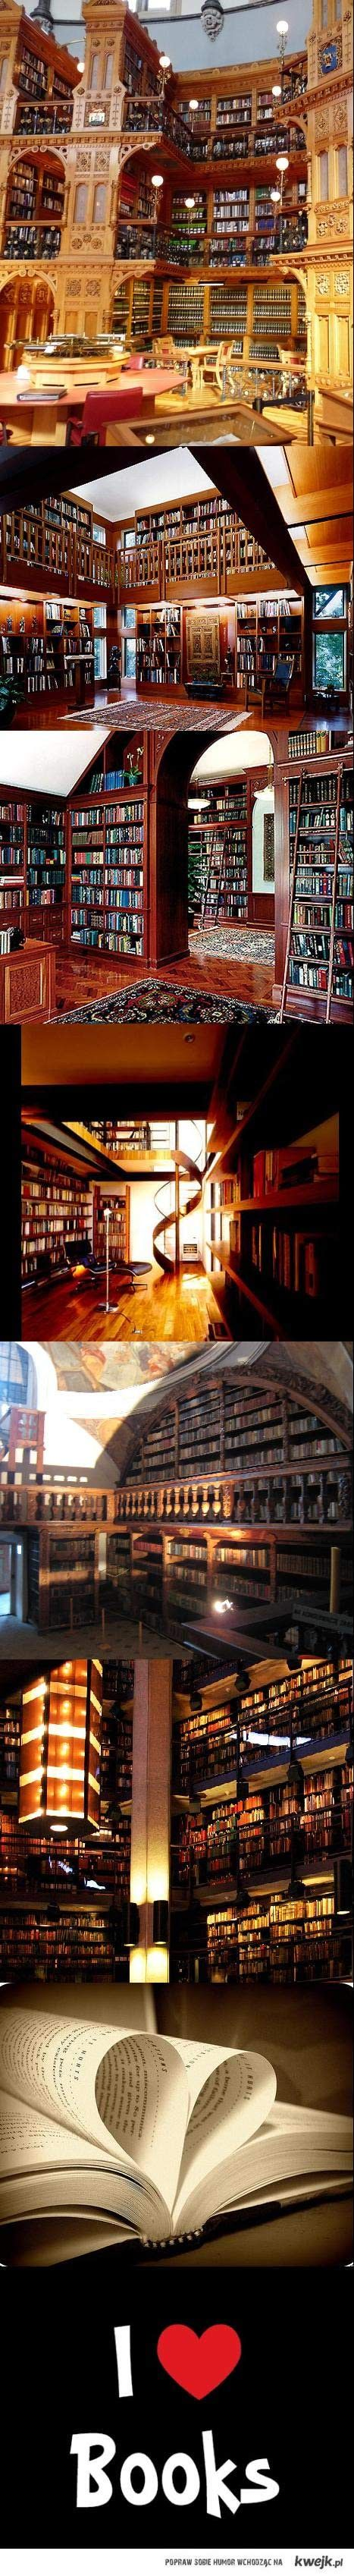 I love books.